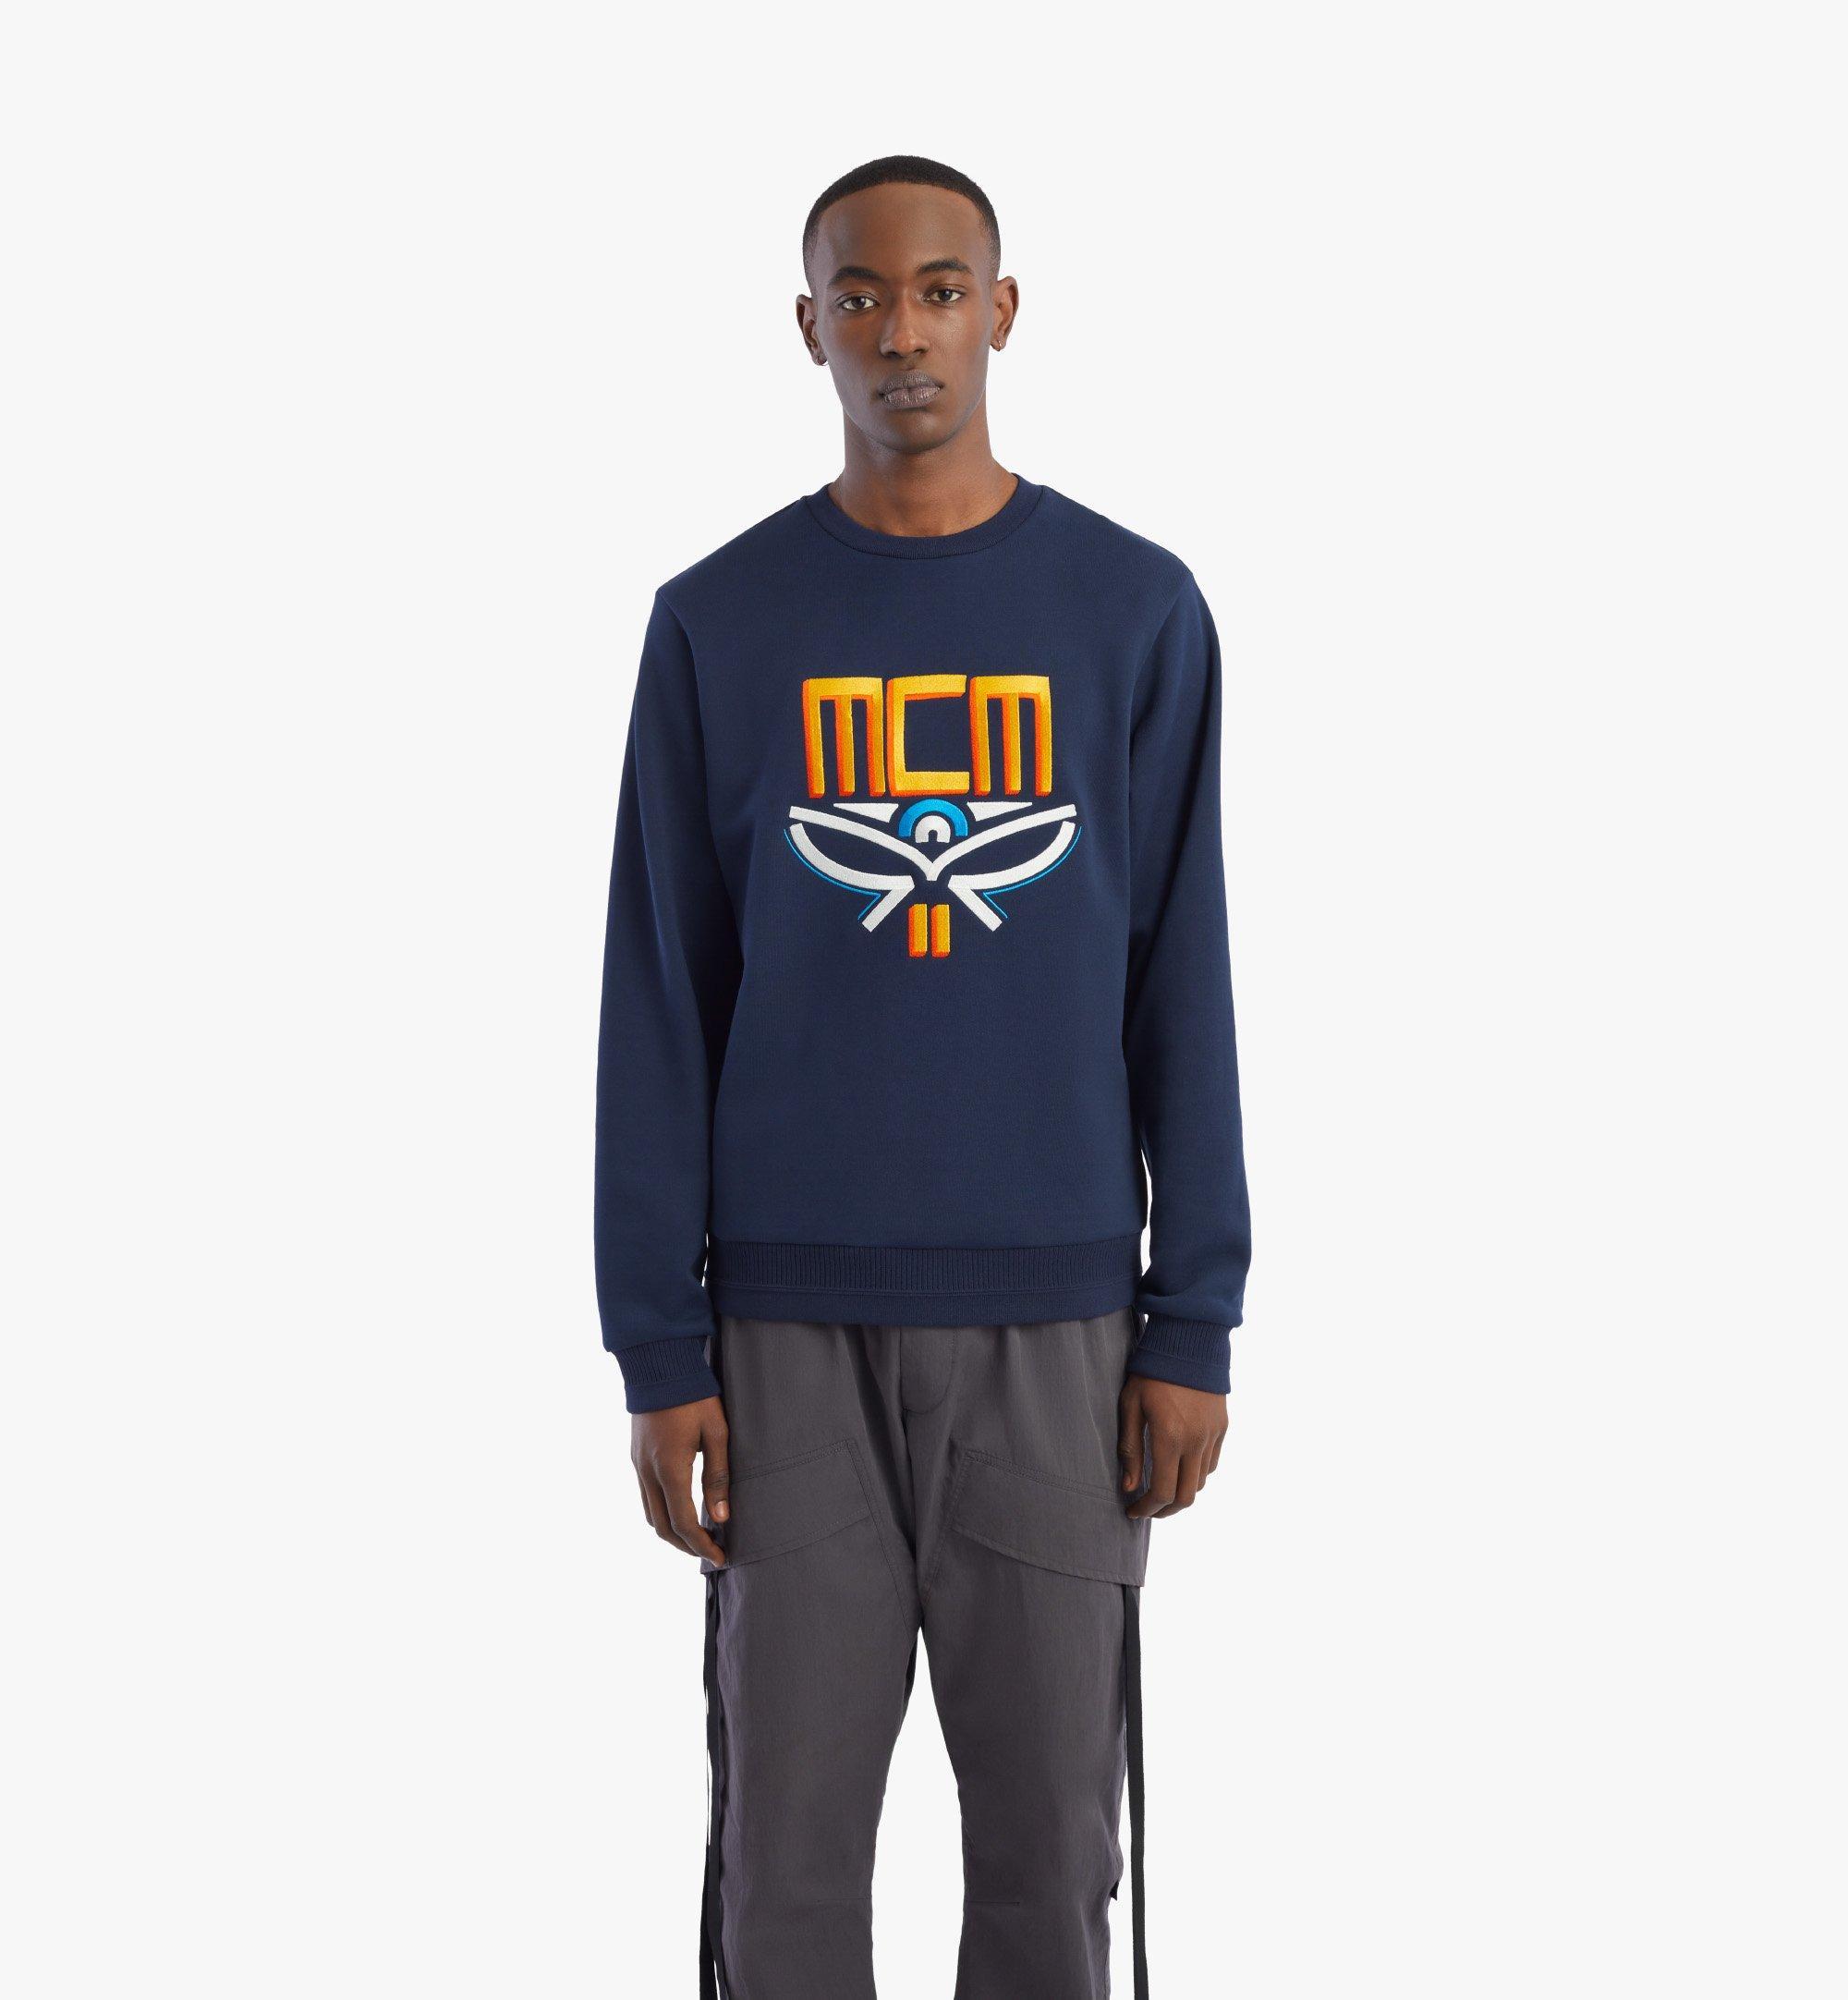 MCM 男士Geo月桂叶运动衫 Blue MHABSMM04U100M 更多视角 2